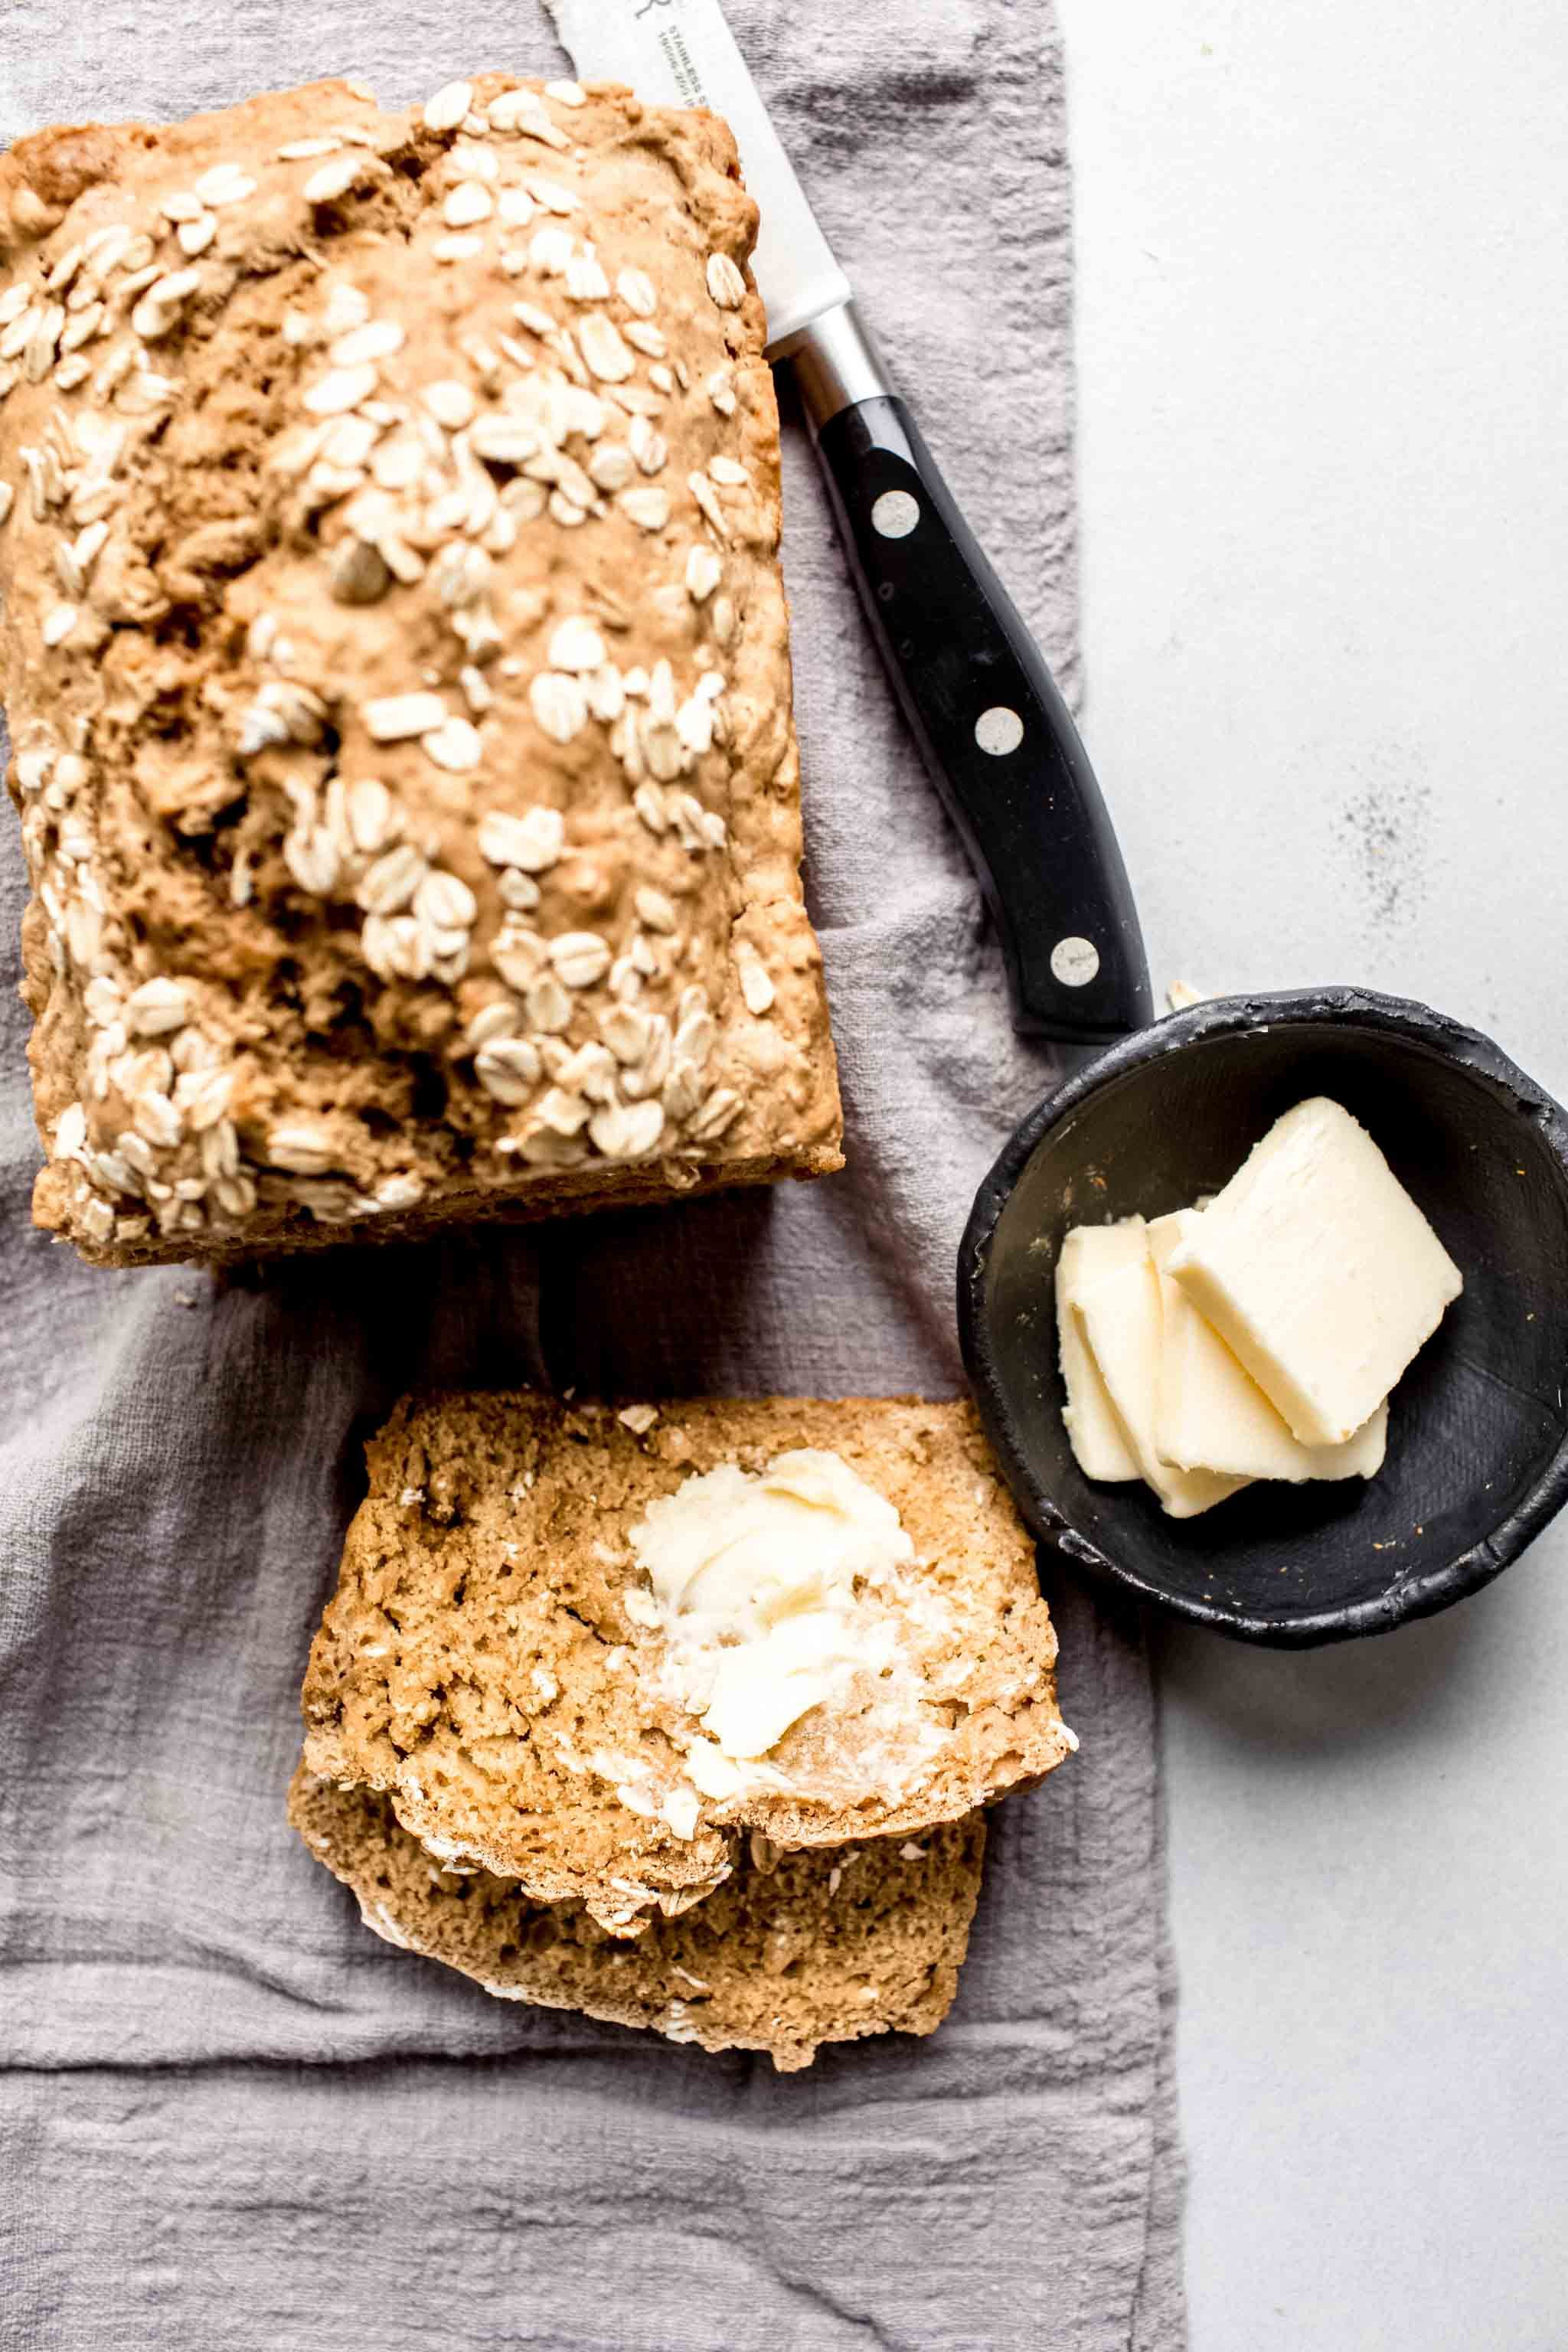 Pin by kristin 🥑 on Foodstuffs in 2020 | Beer bread, Food ...